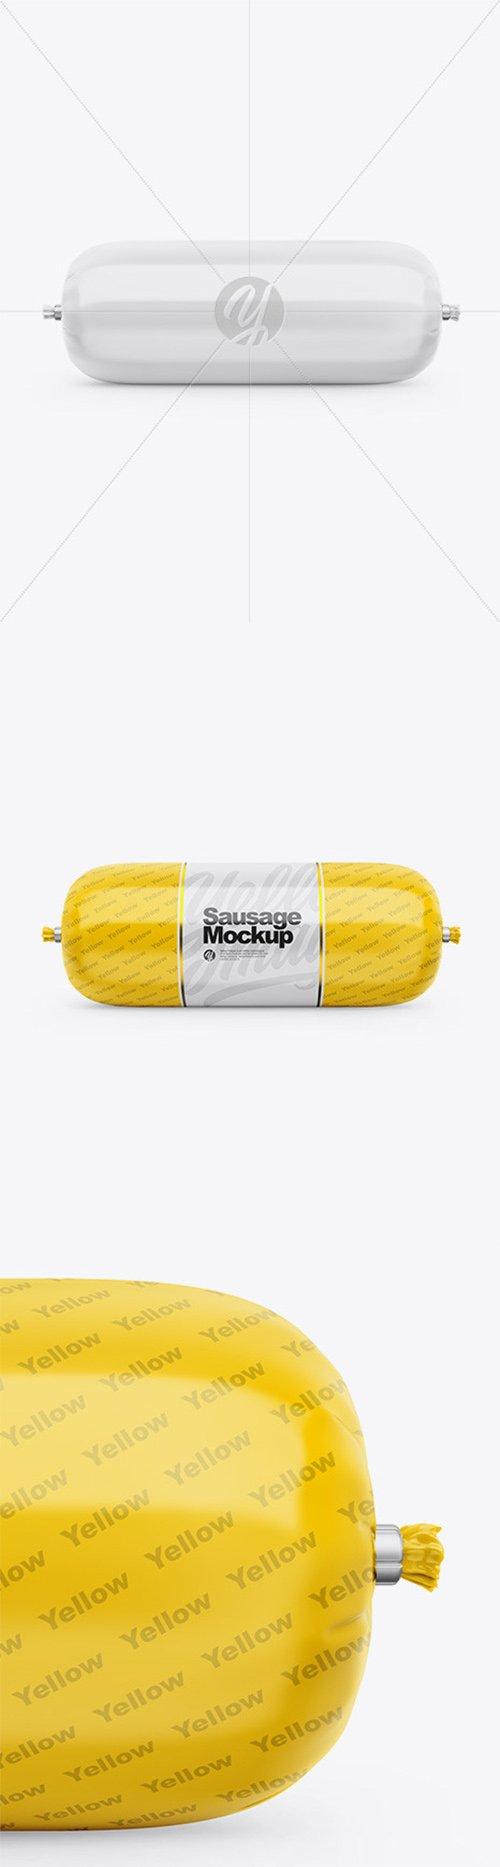 Glossy Sausage Chub Mockup 64647